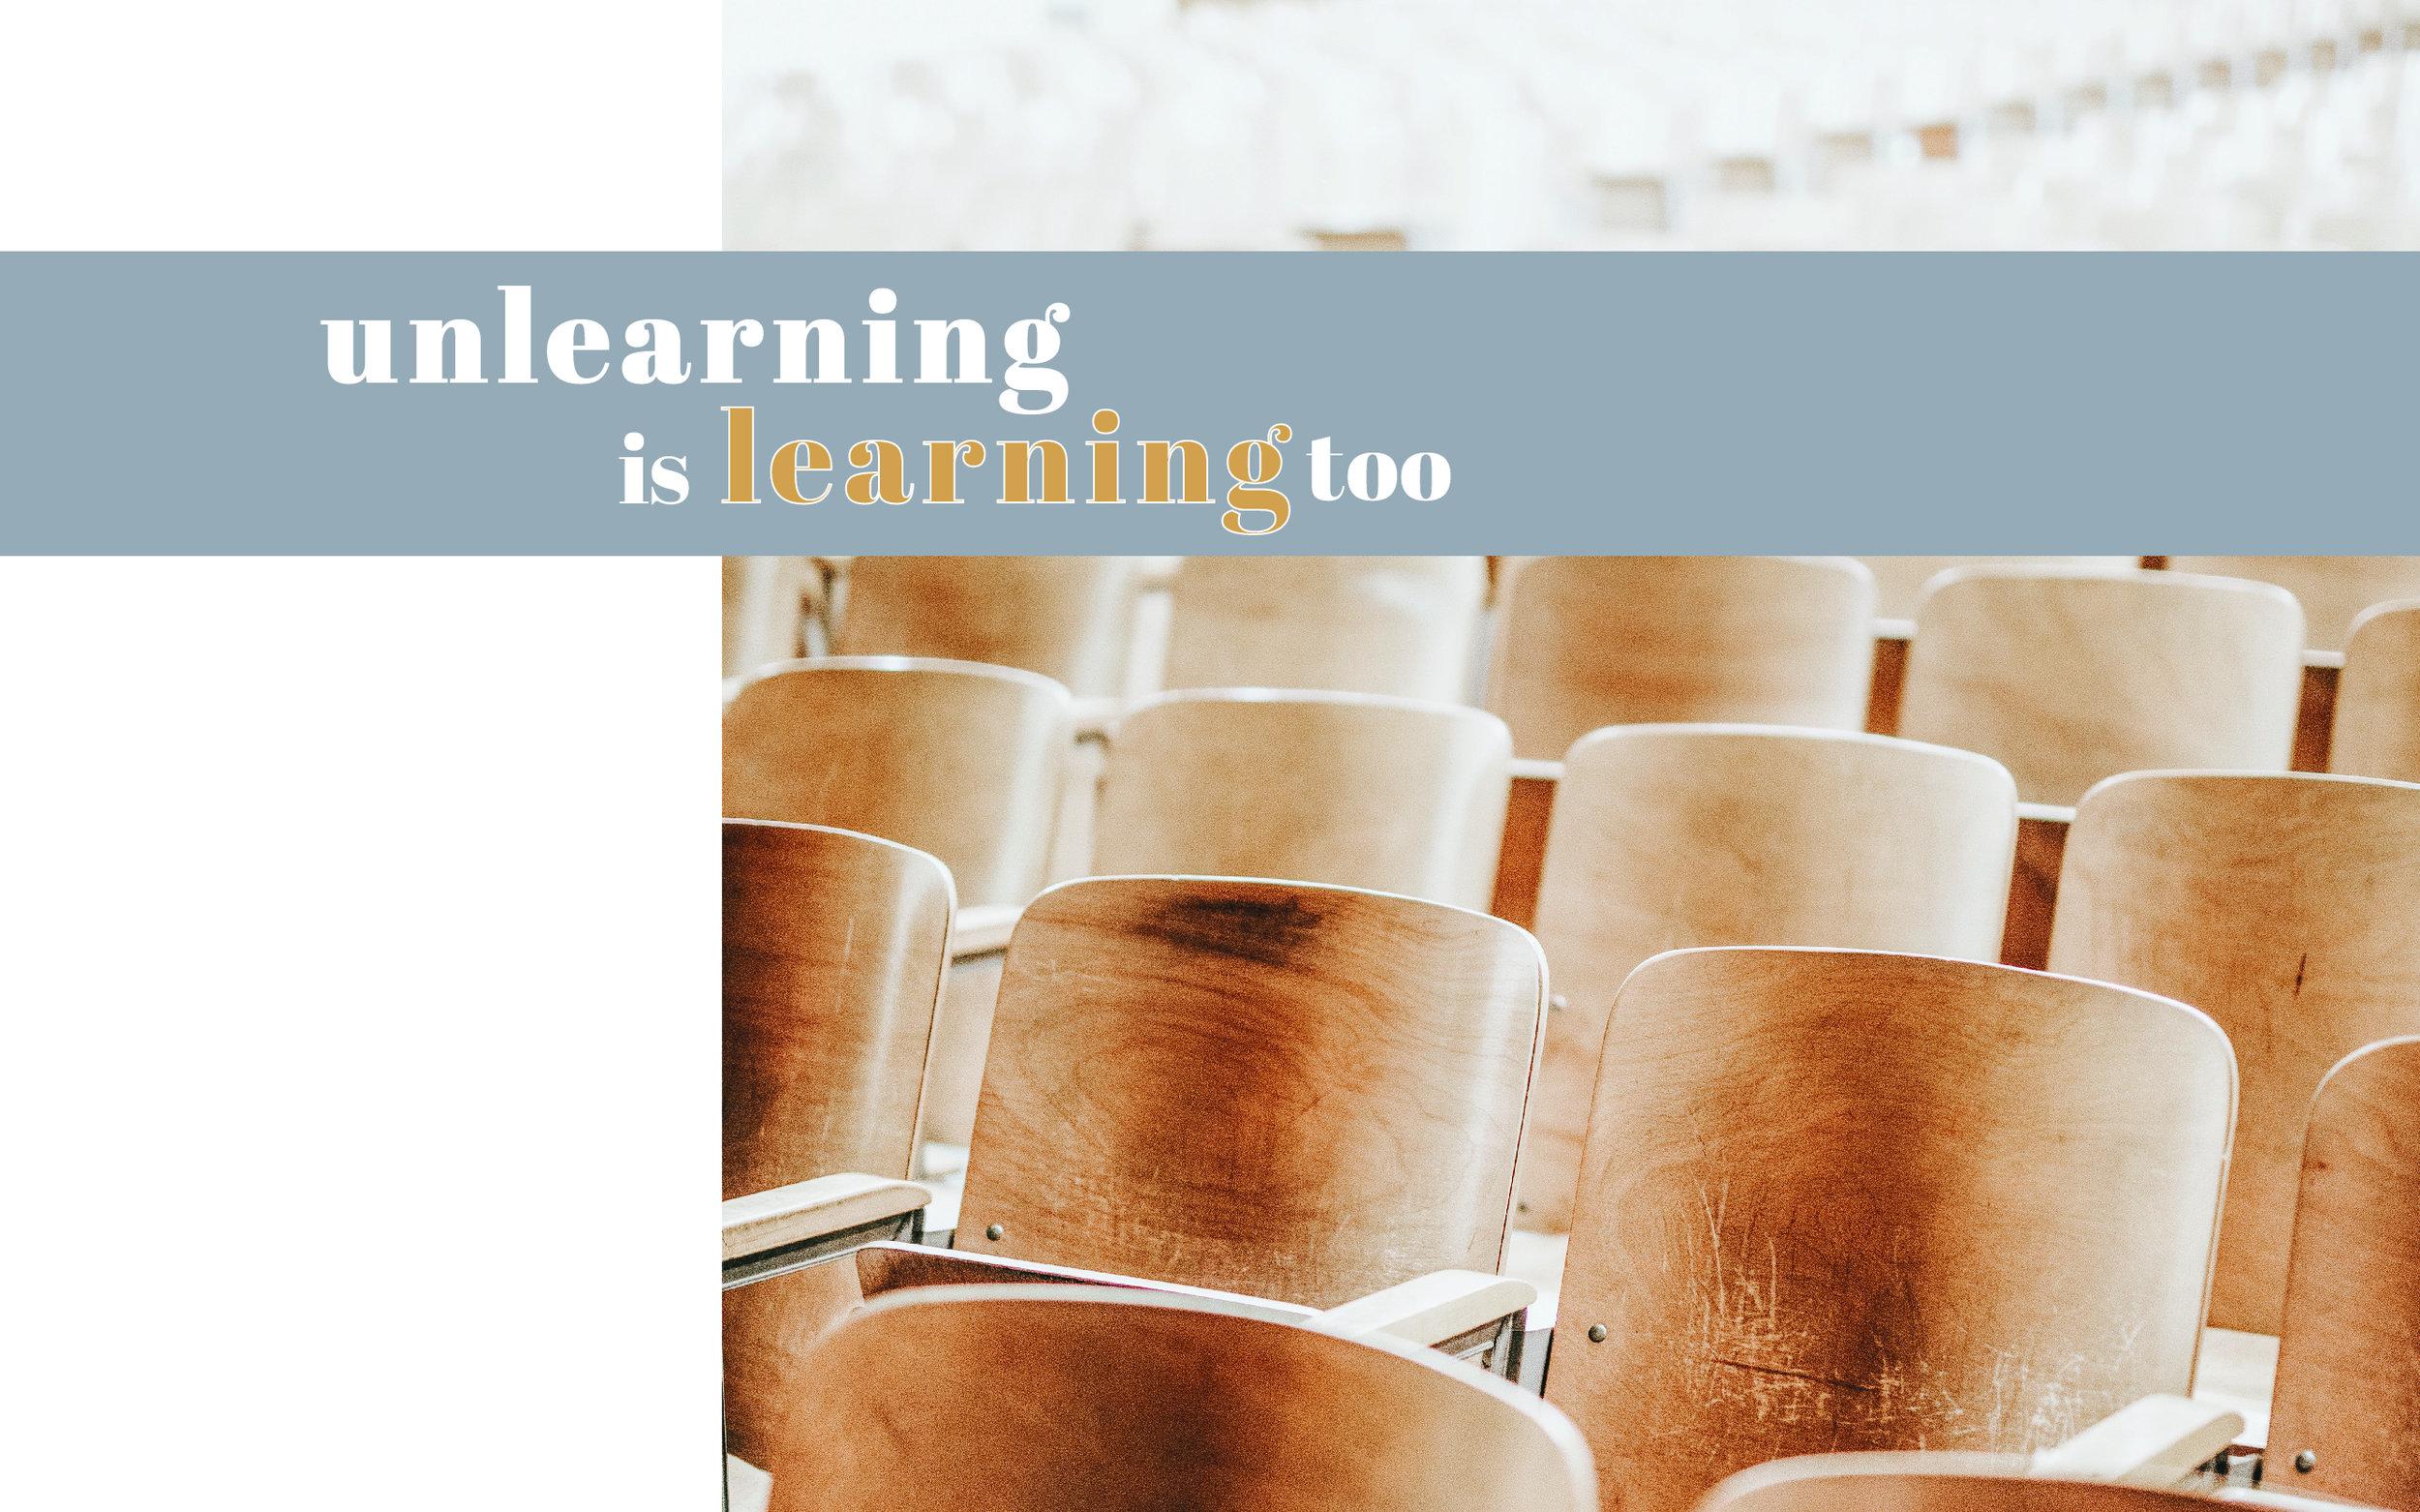 5-30-19 Unlearning-01.JPG